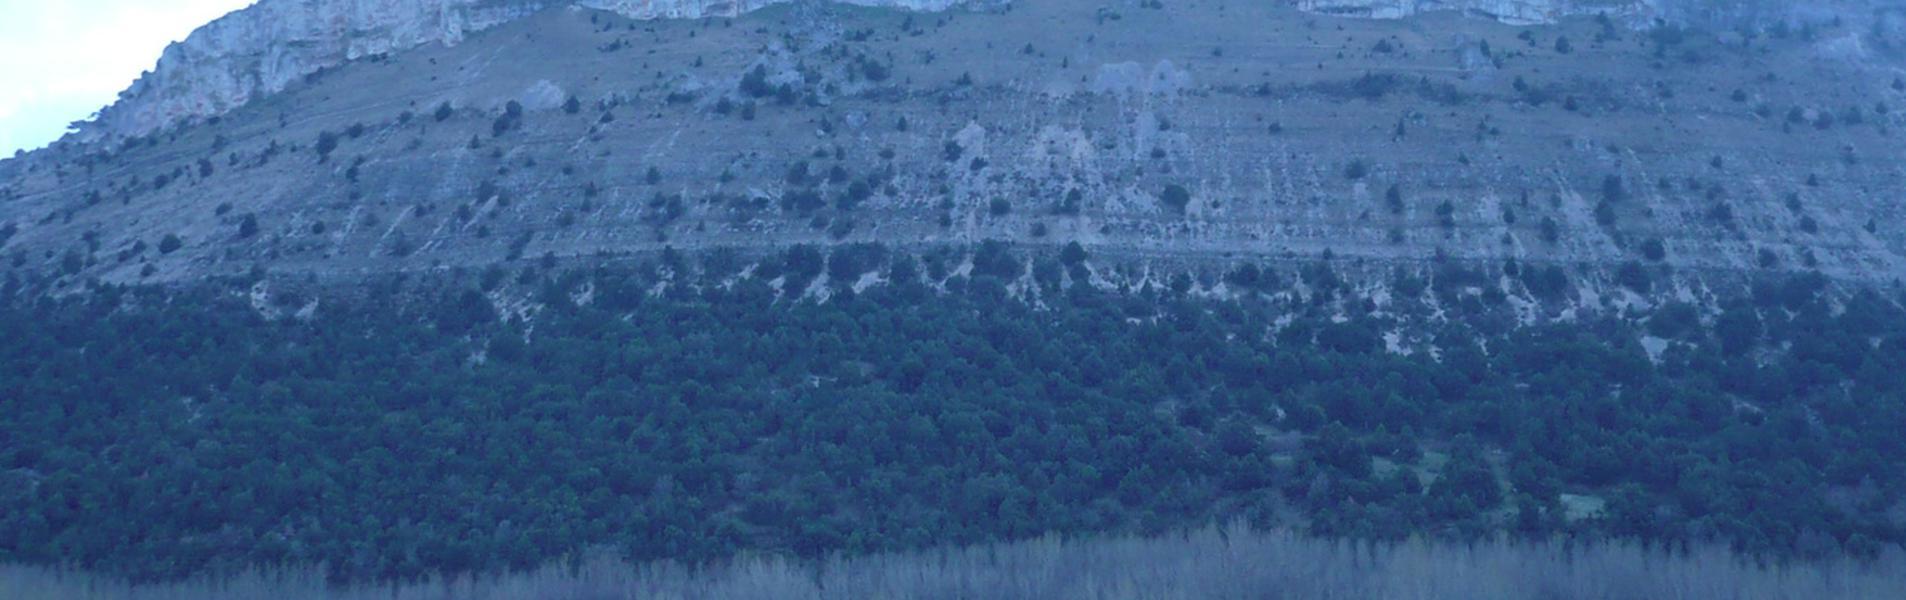 Cascajares de la Sierra